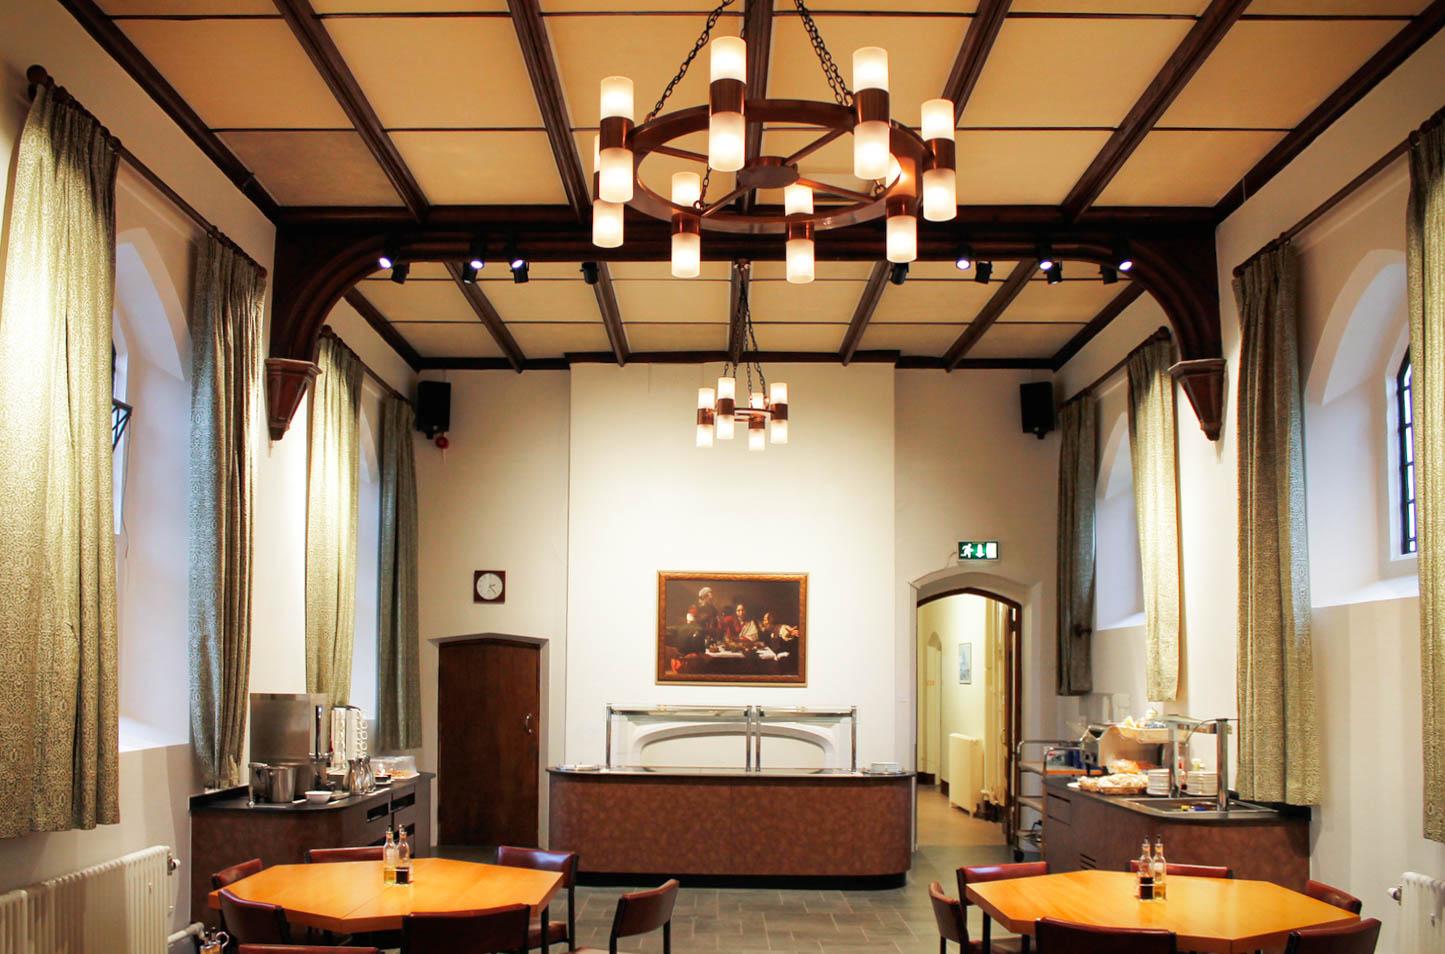 Interior design for historic building